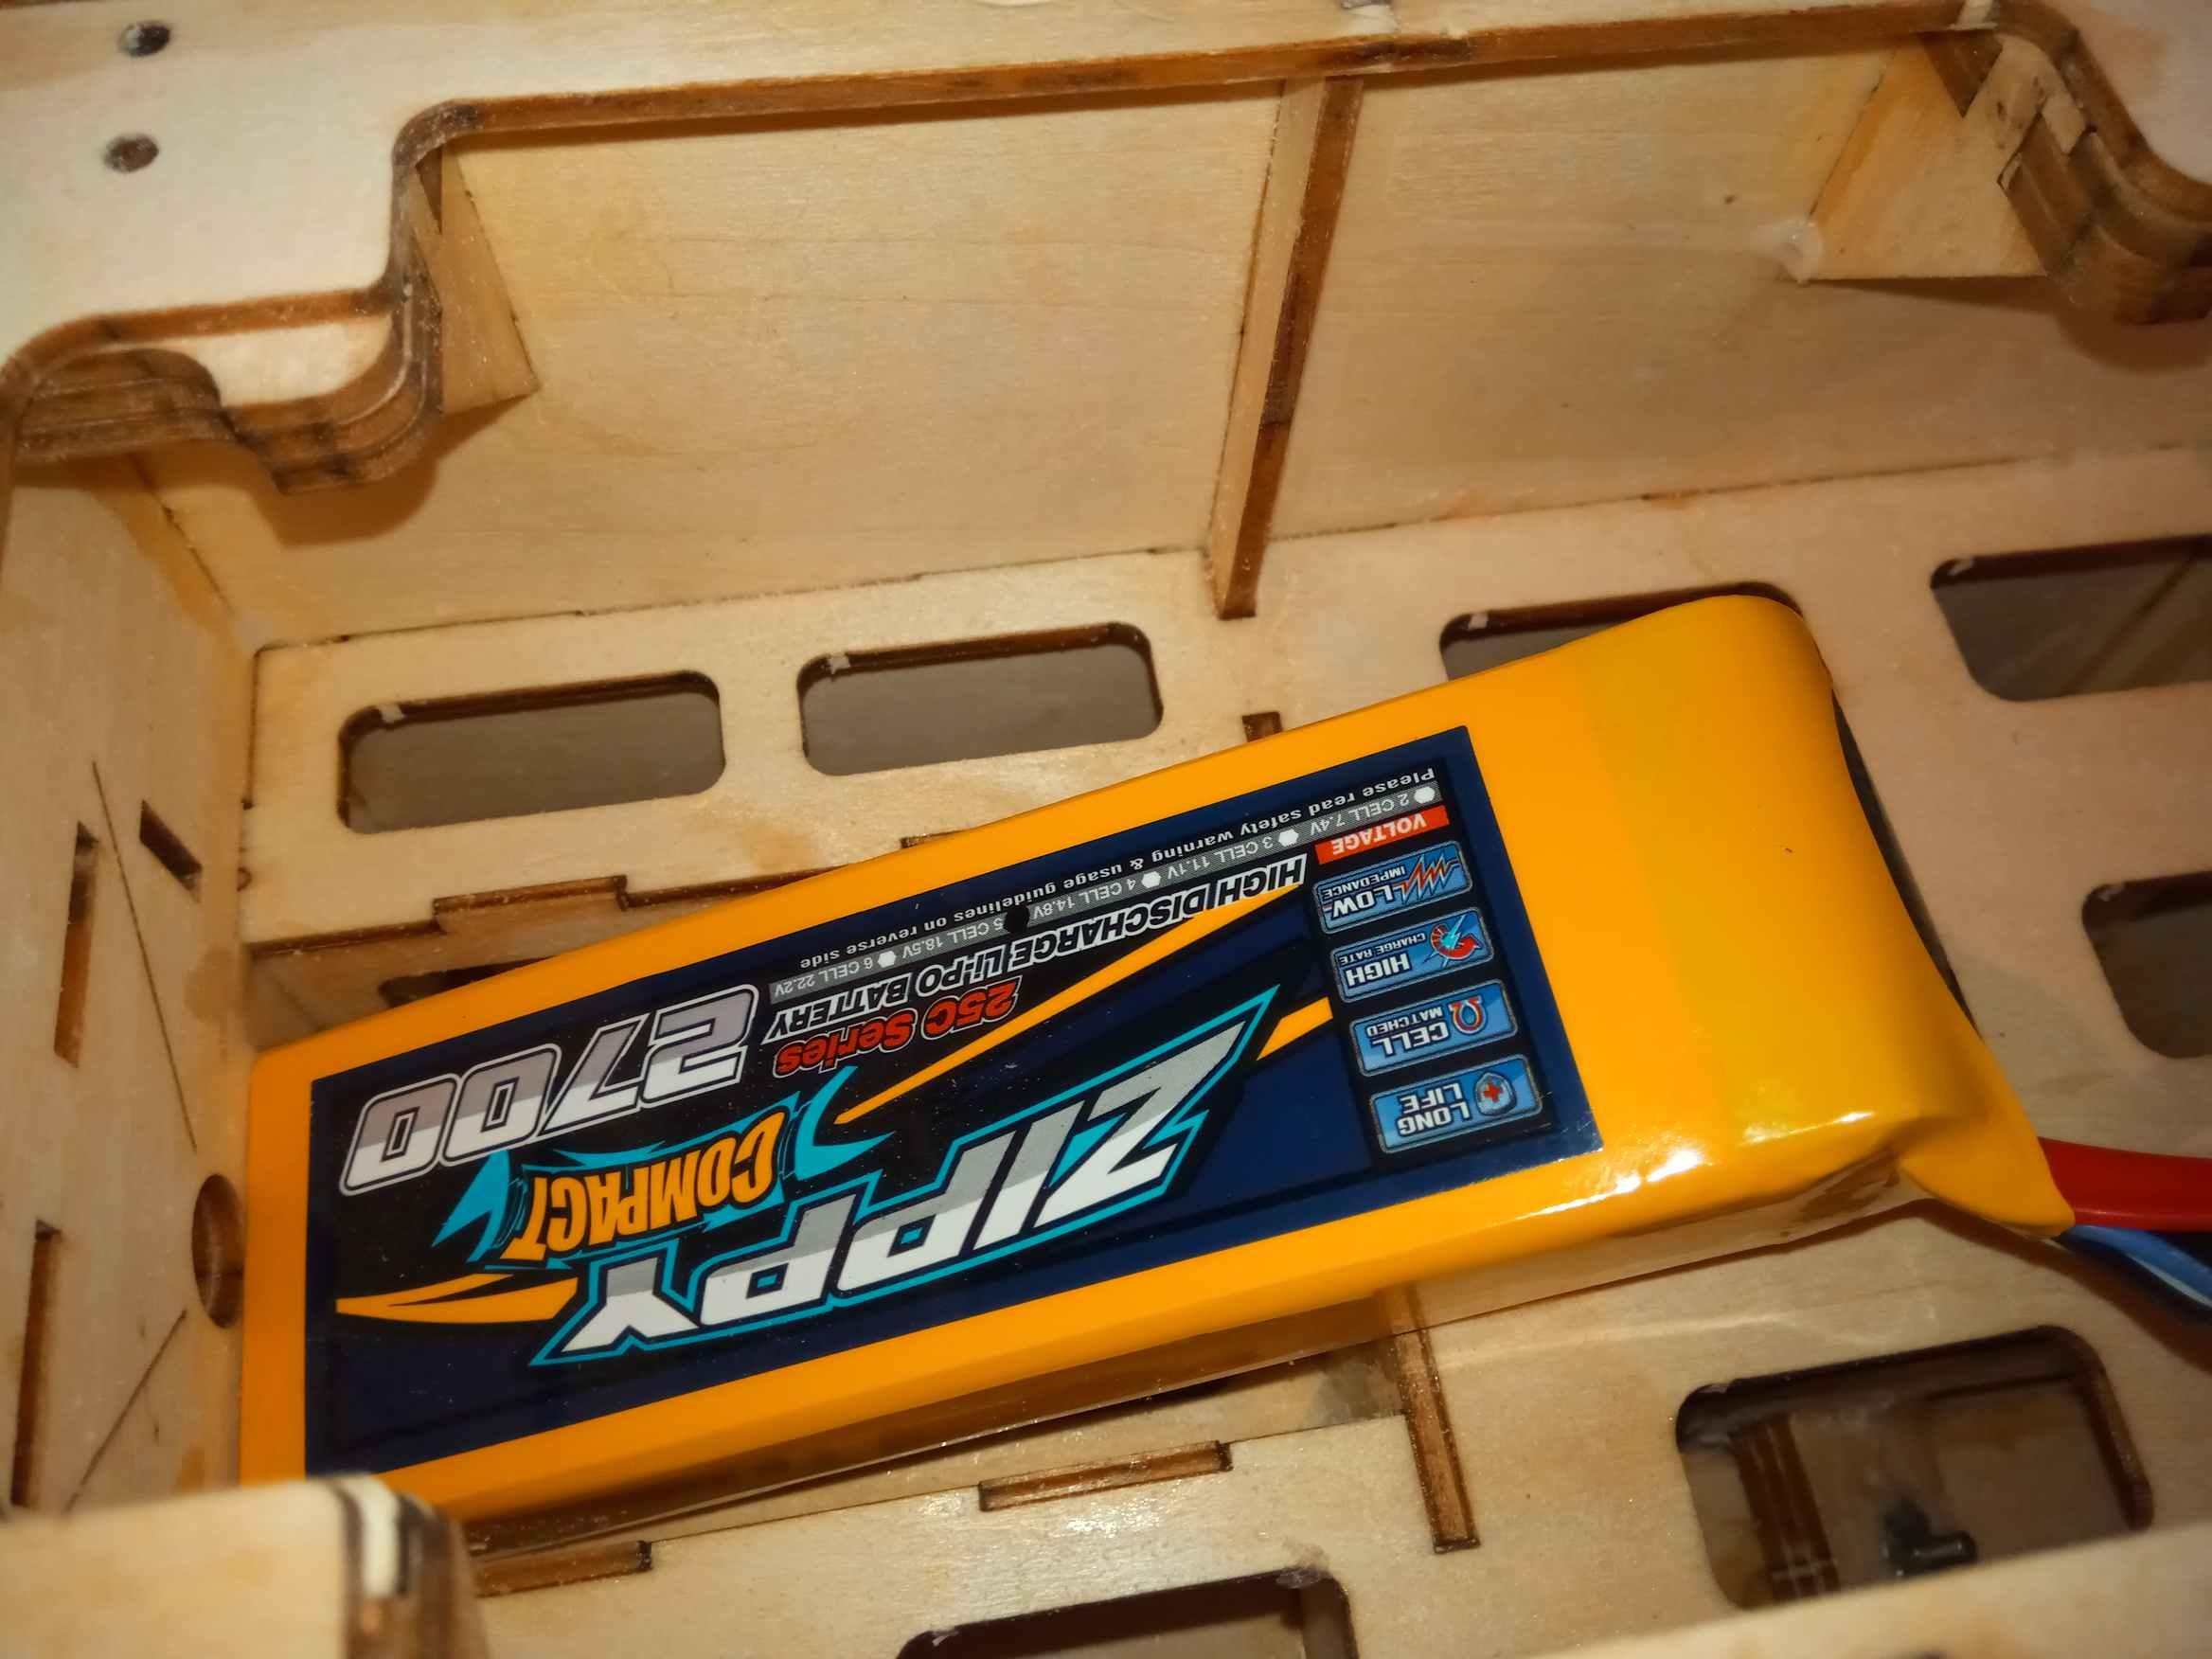 sc battery bay.jpg